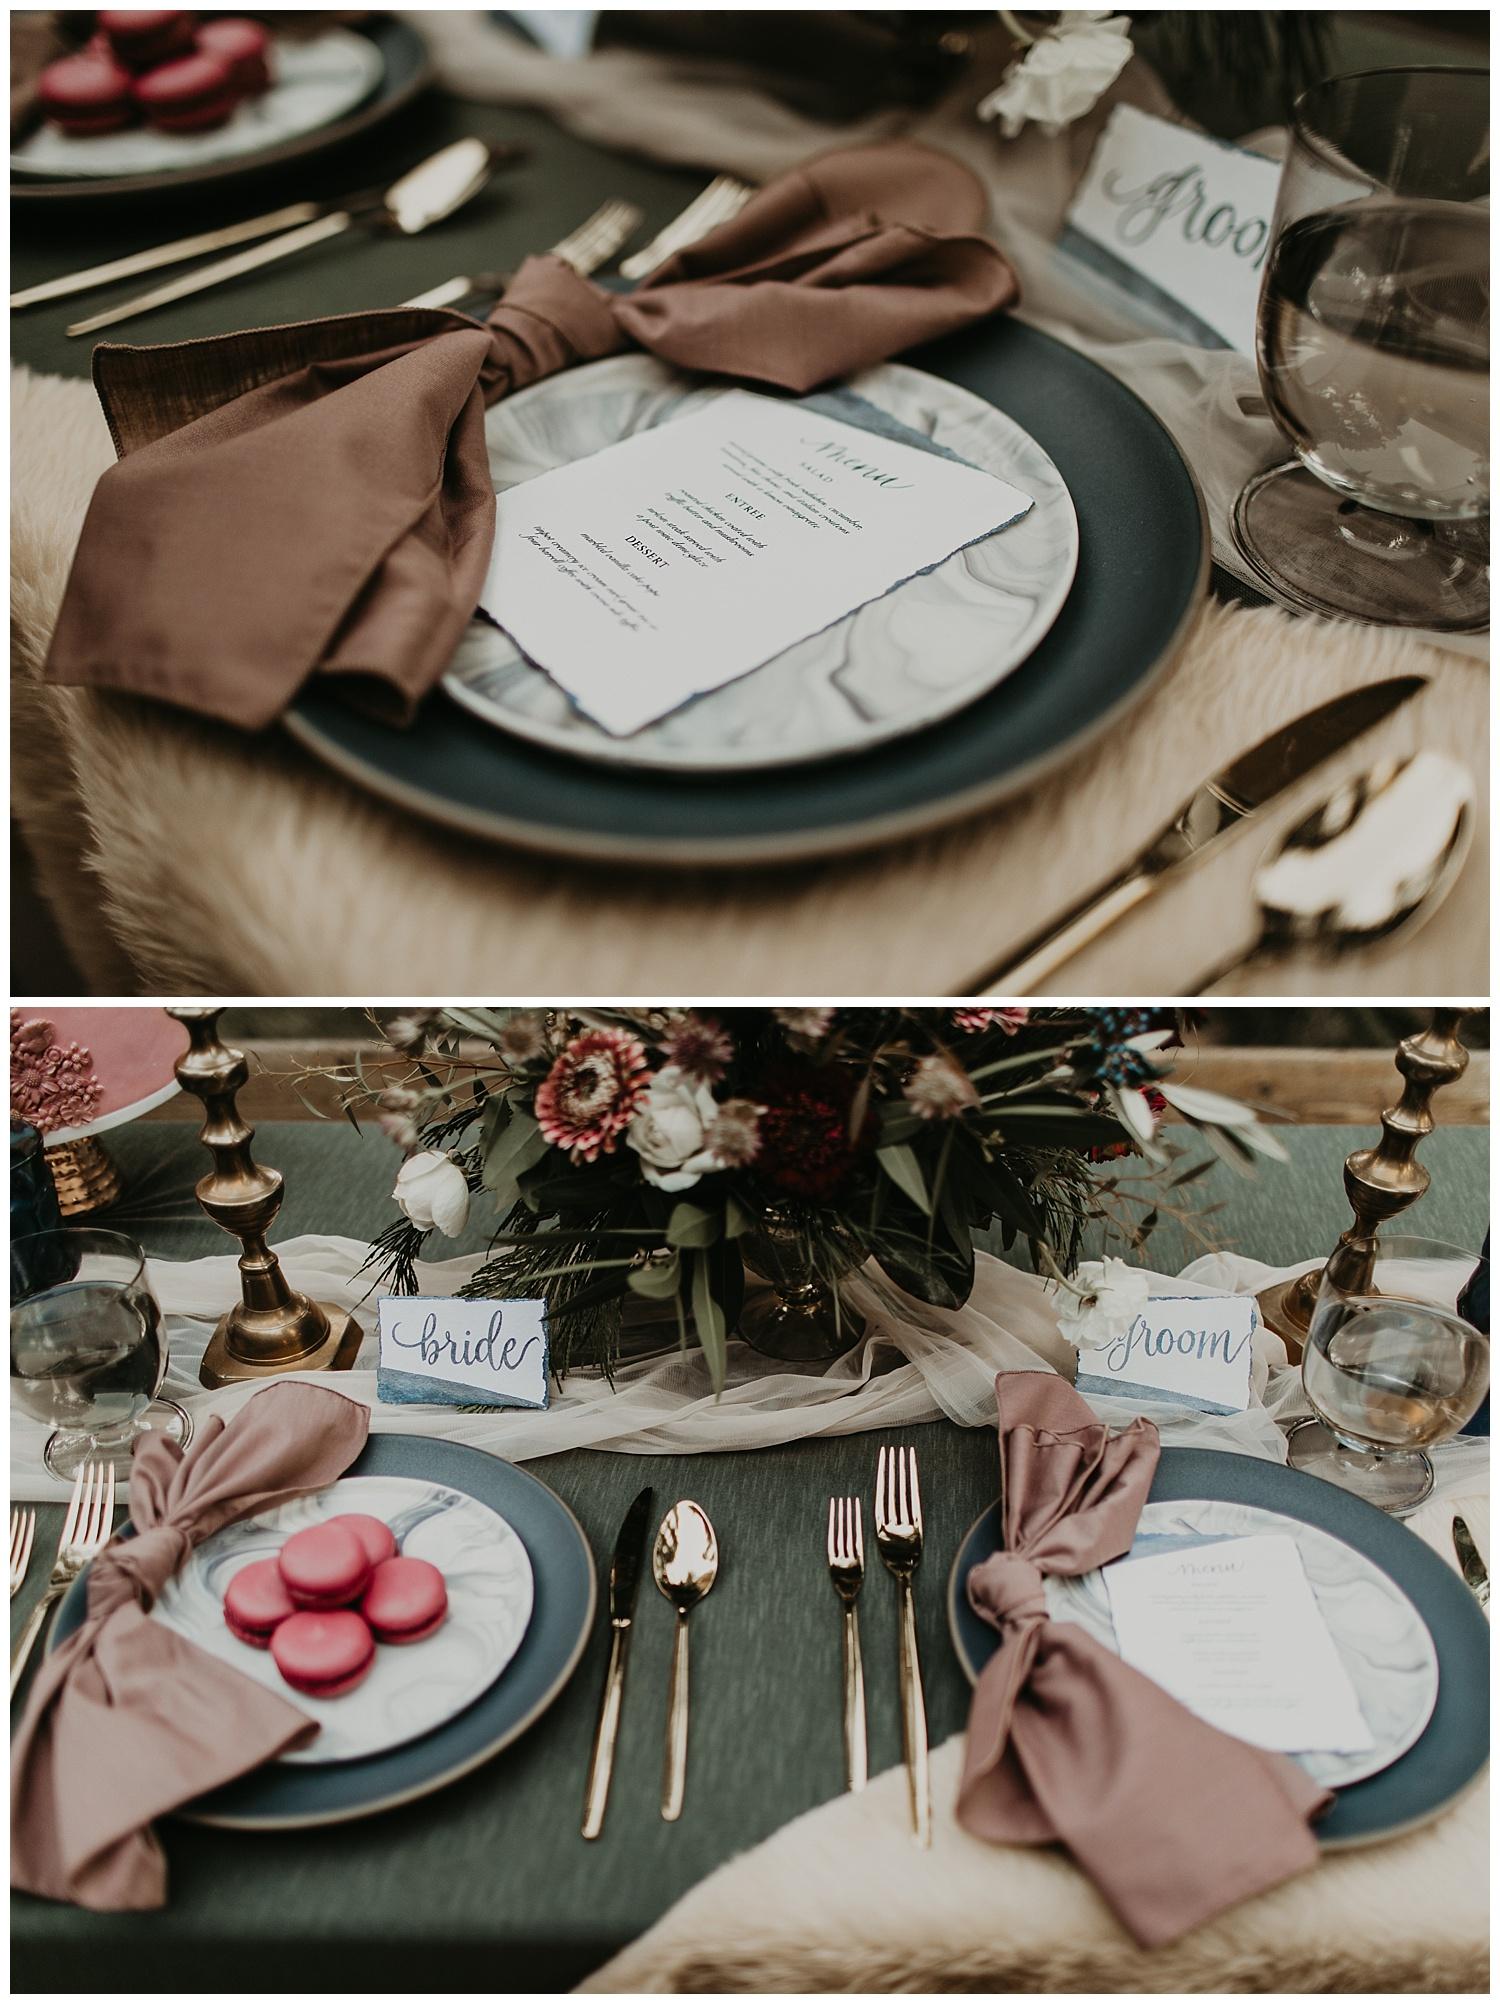 lake-tahoe-winter-wedding-table-setting-inspiration.jpg